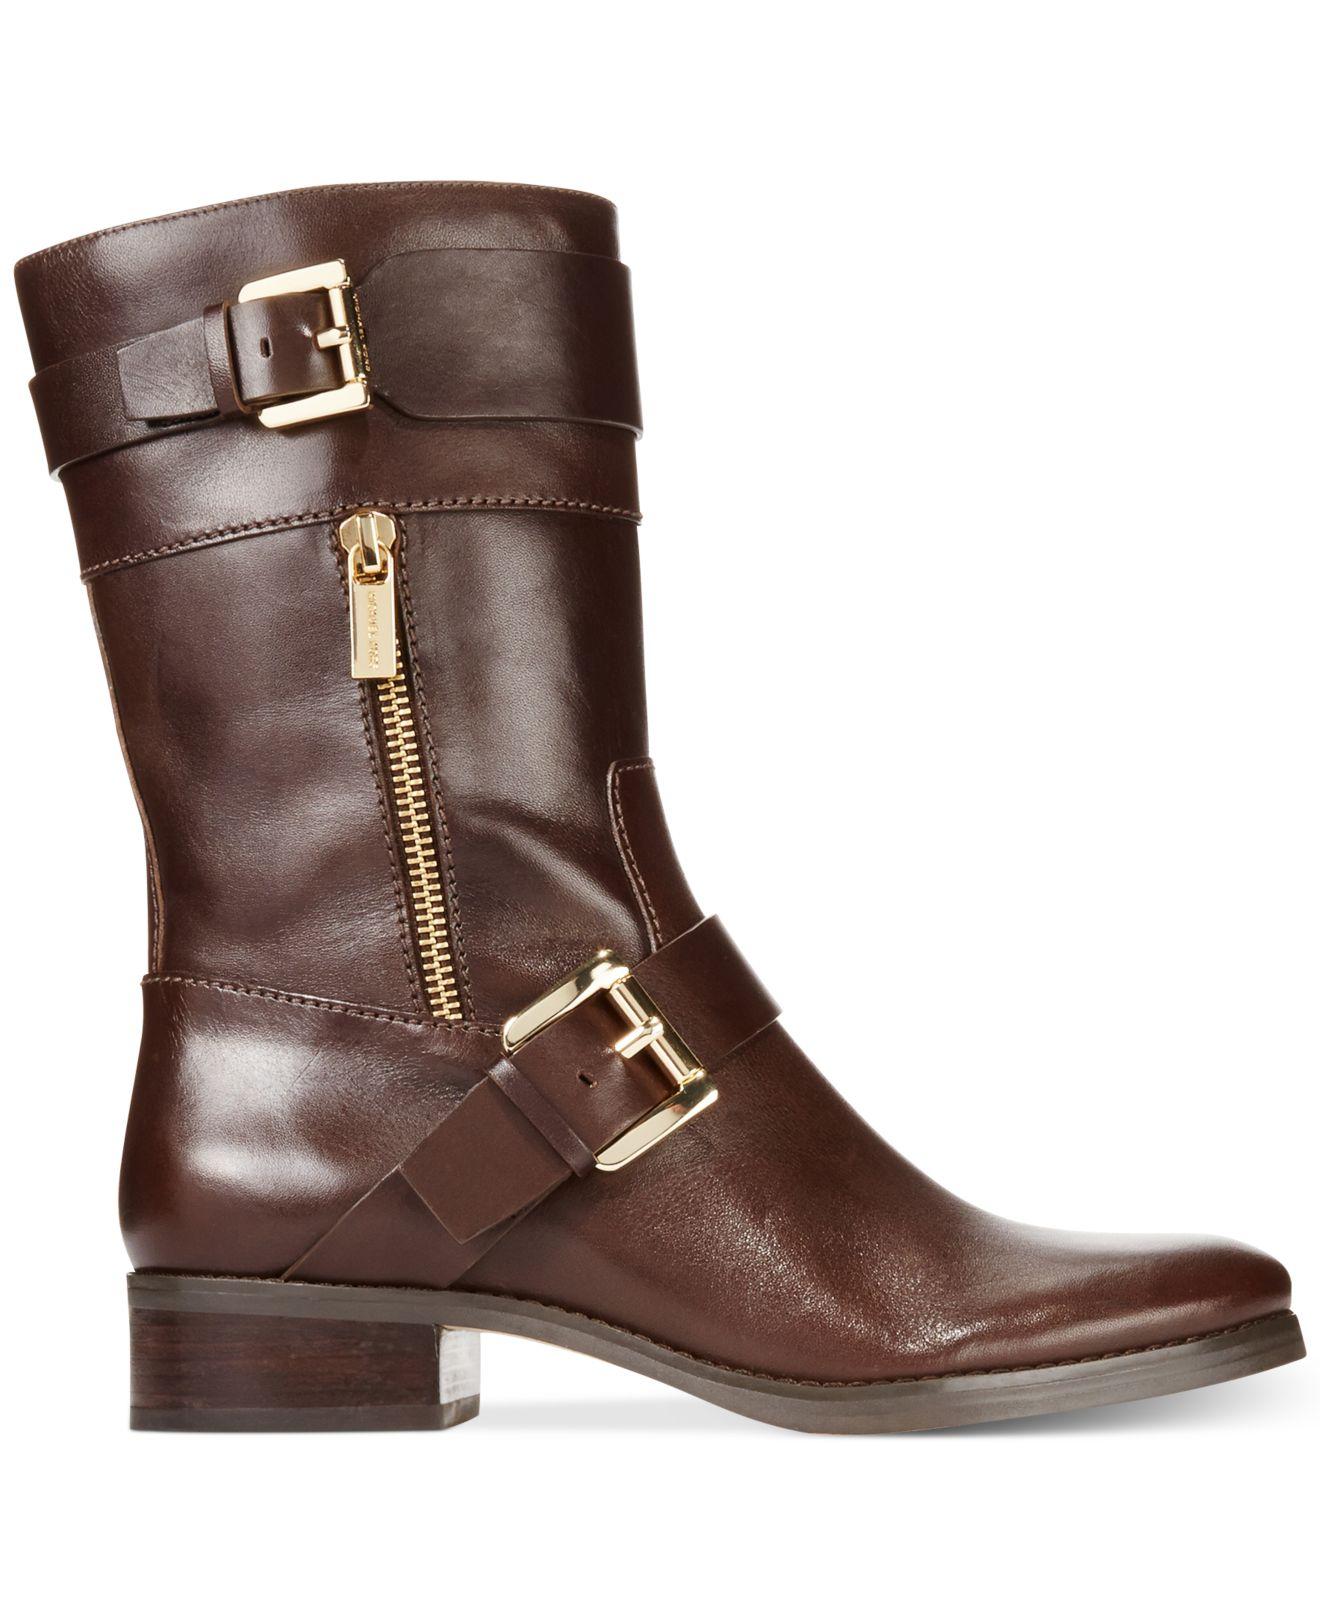 michael kors michael gansevoort flat boots in brown lyst